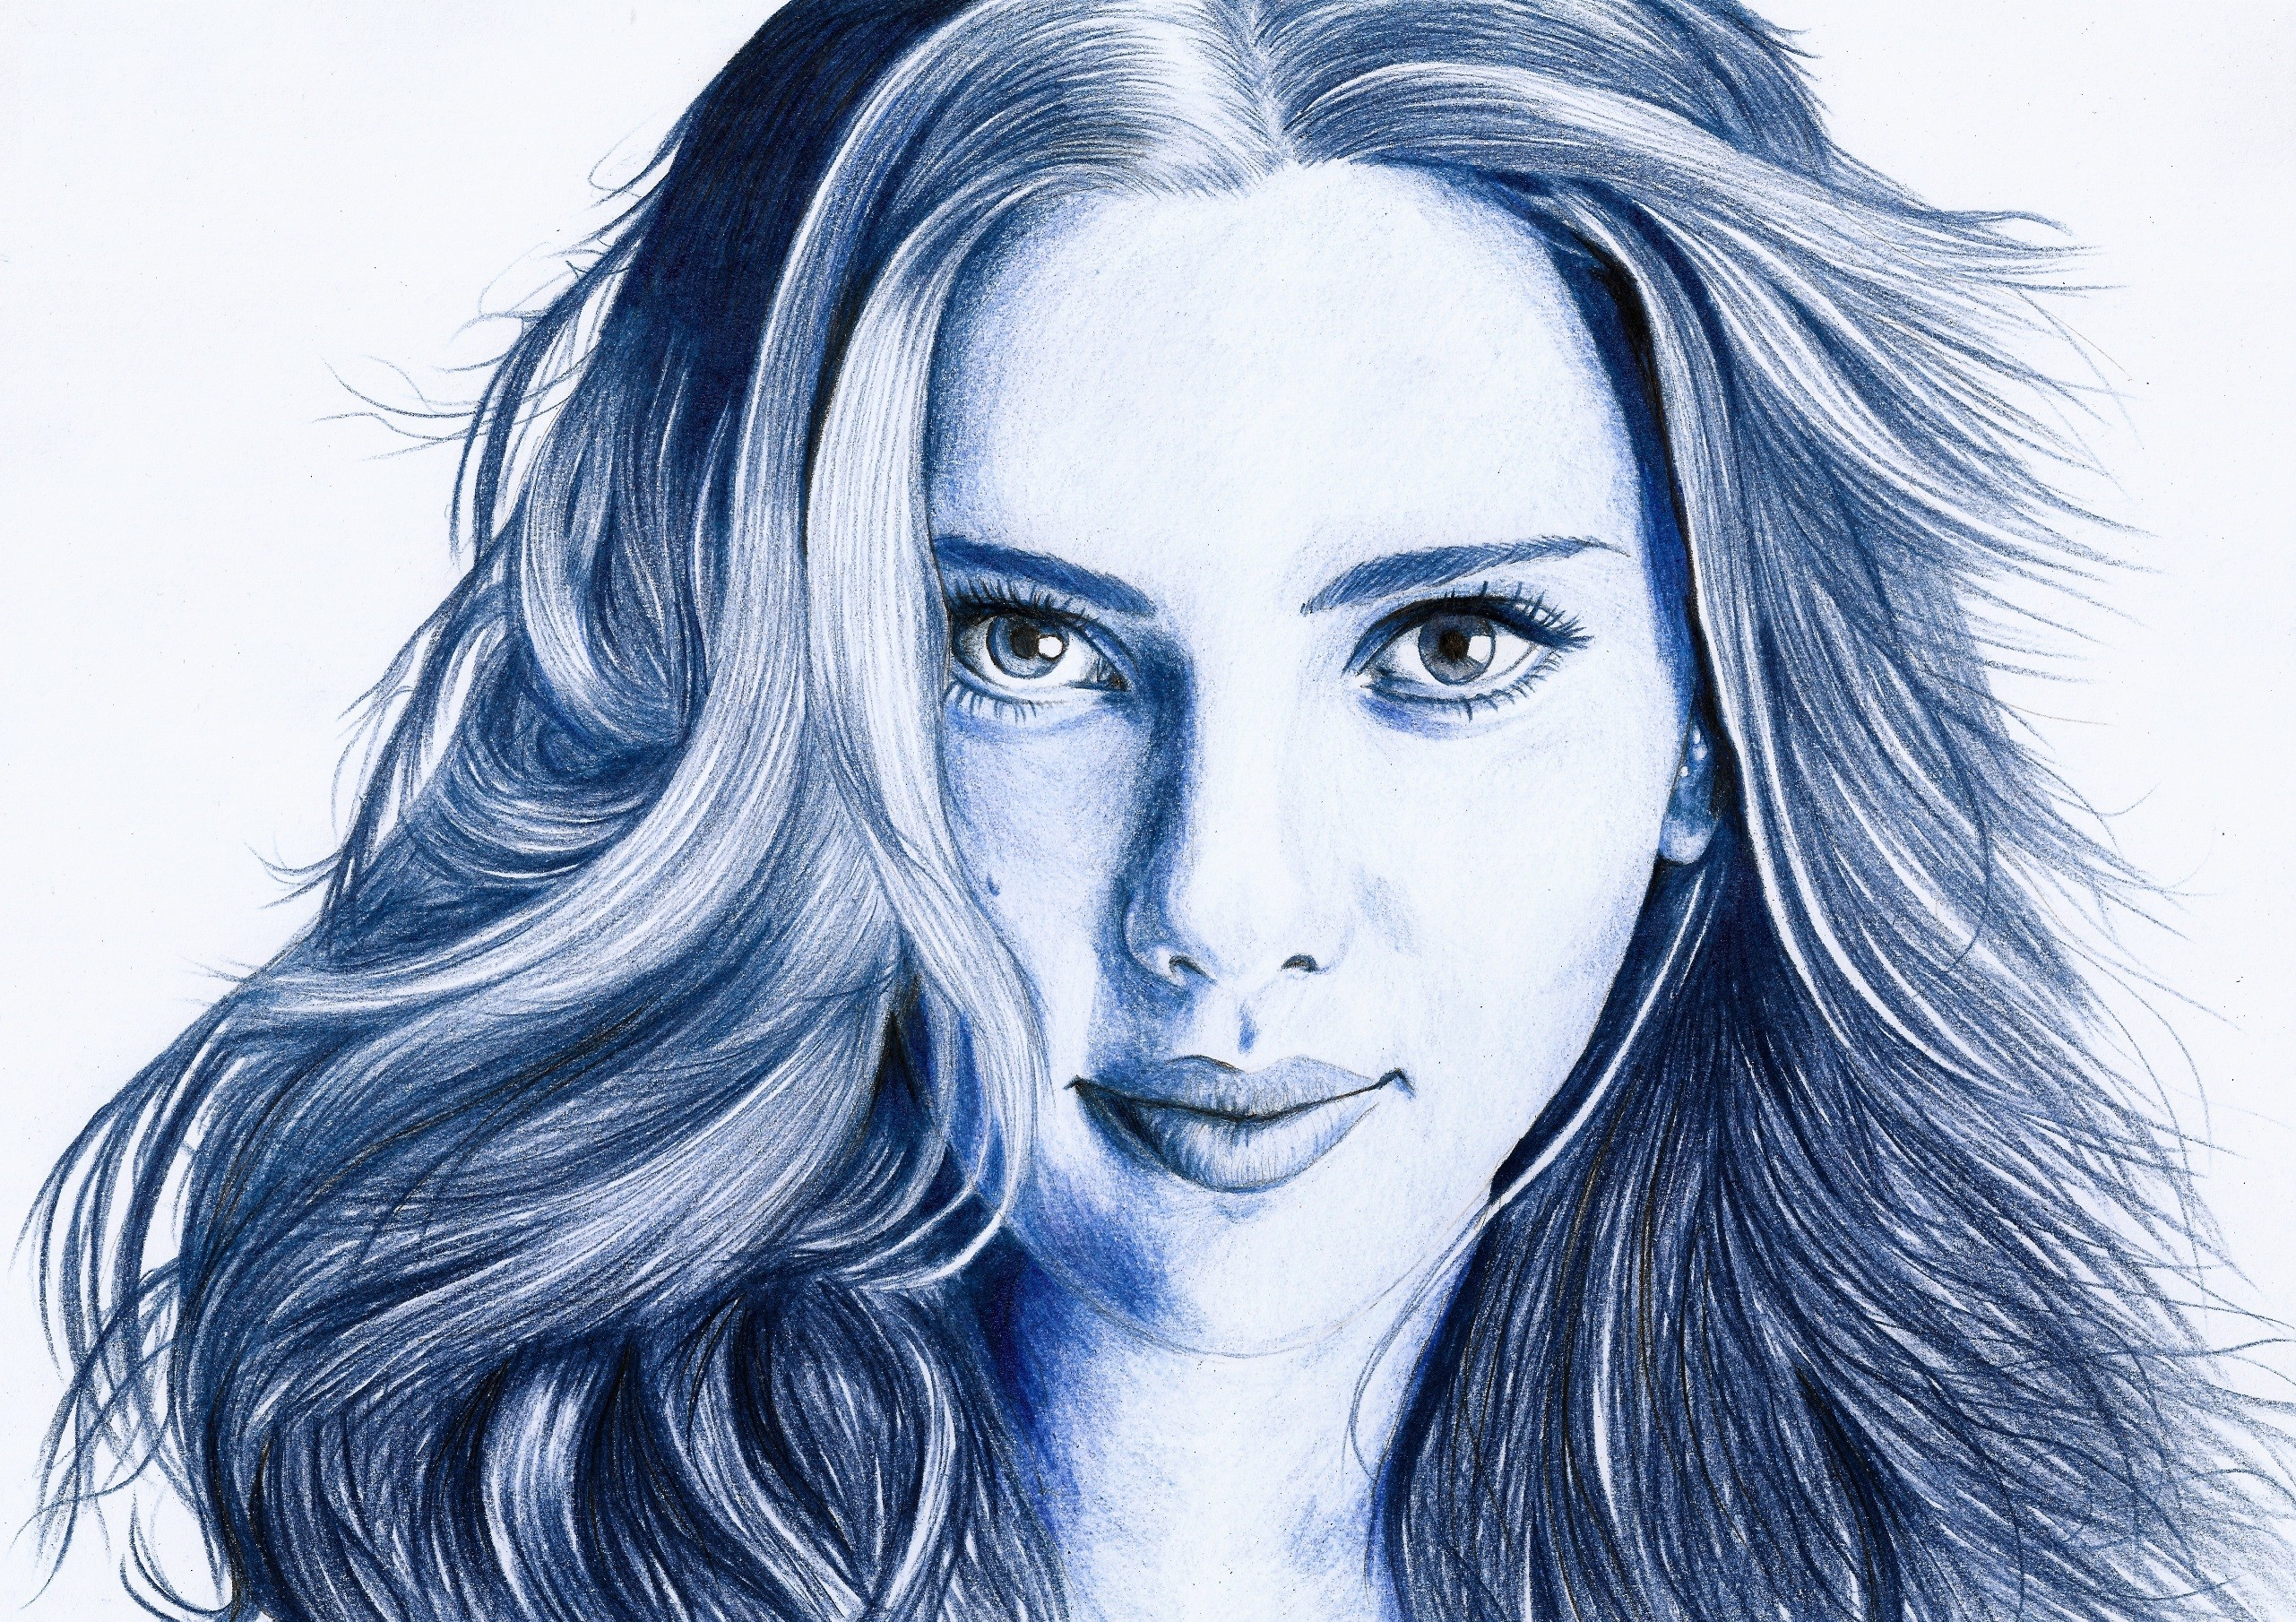 2562x1810 Wallpaper Face, Illustration, Portrait, Artwork, Charcoal, Head